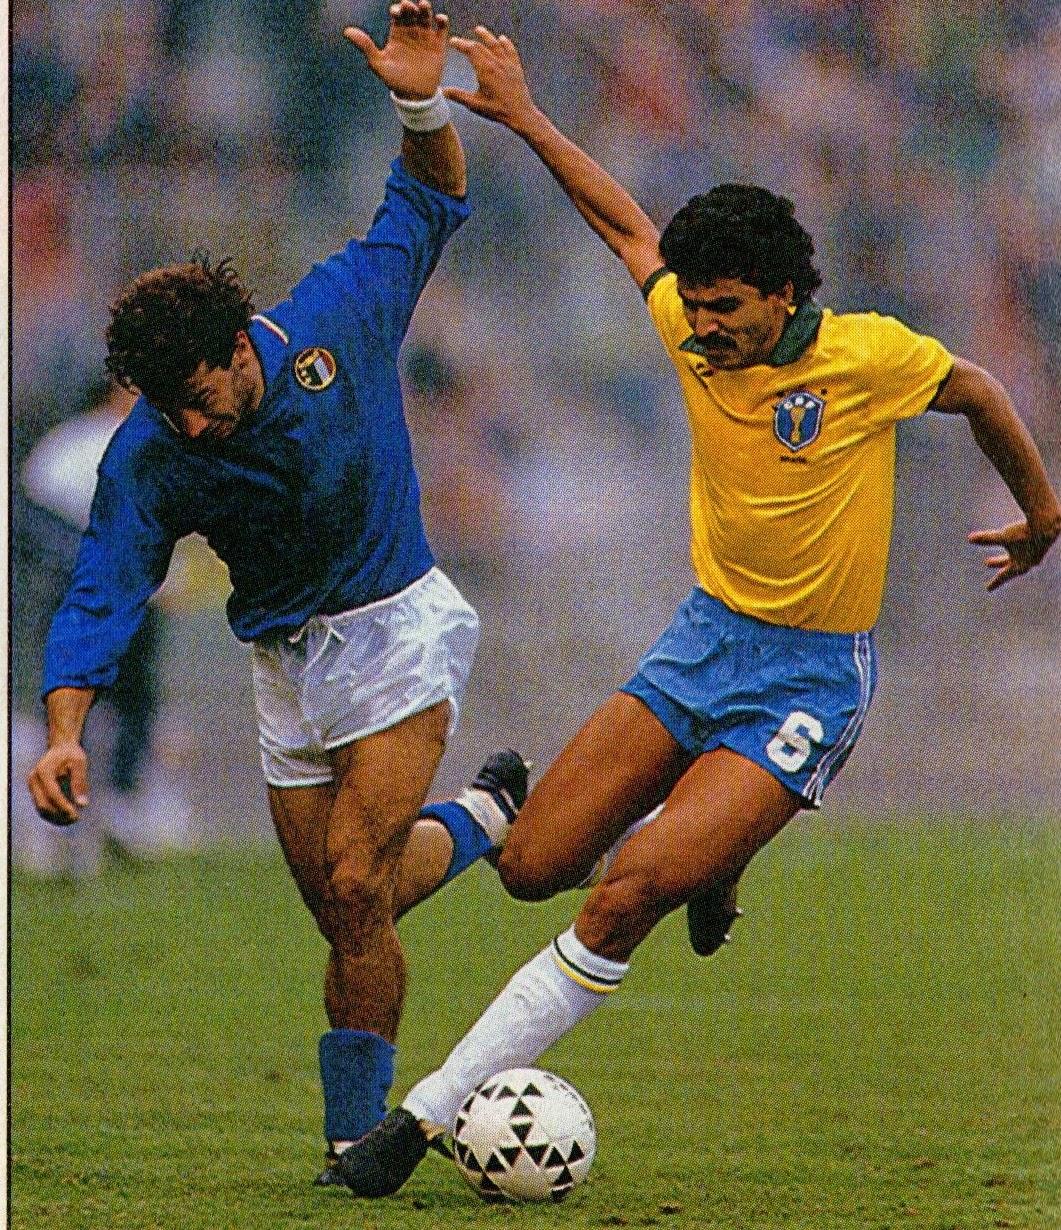 31ed4fed876 Photo From: Guerin Sportivo, October 18-24, 1989. (Gianluca Vialli and  Ricardo Rocha)